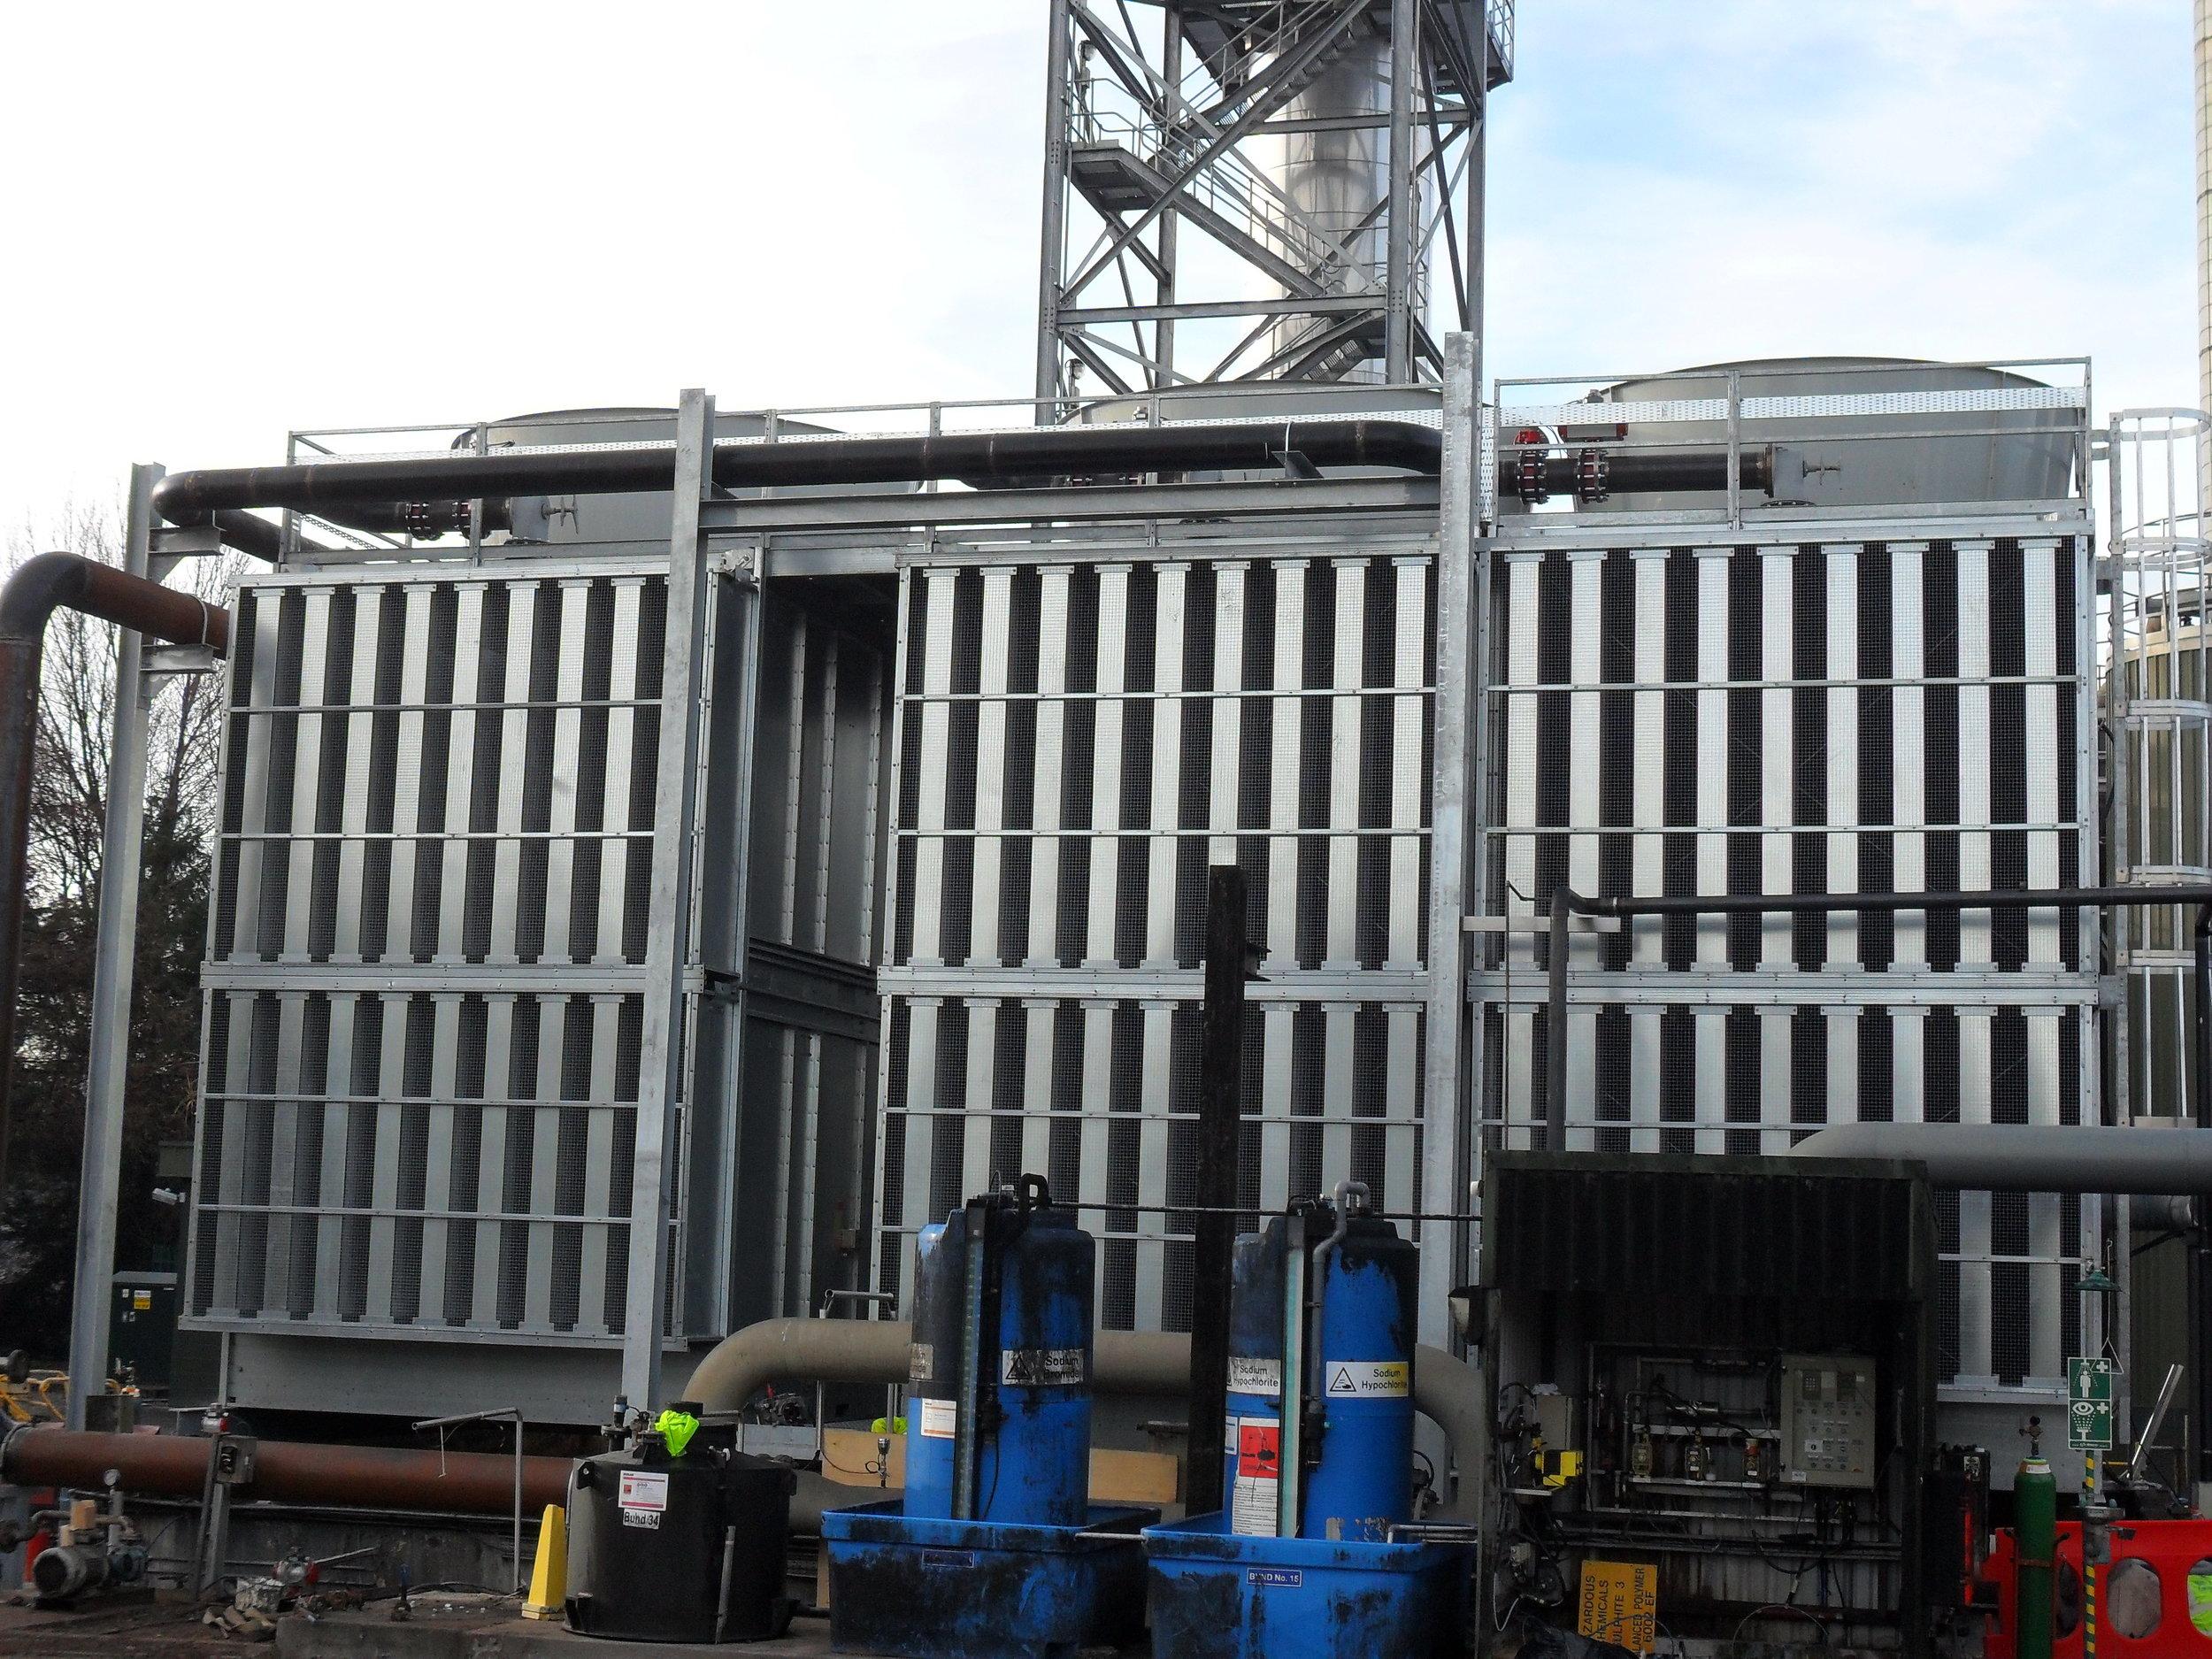 Tower installation 25 Mw<br>2010 Distillery